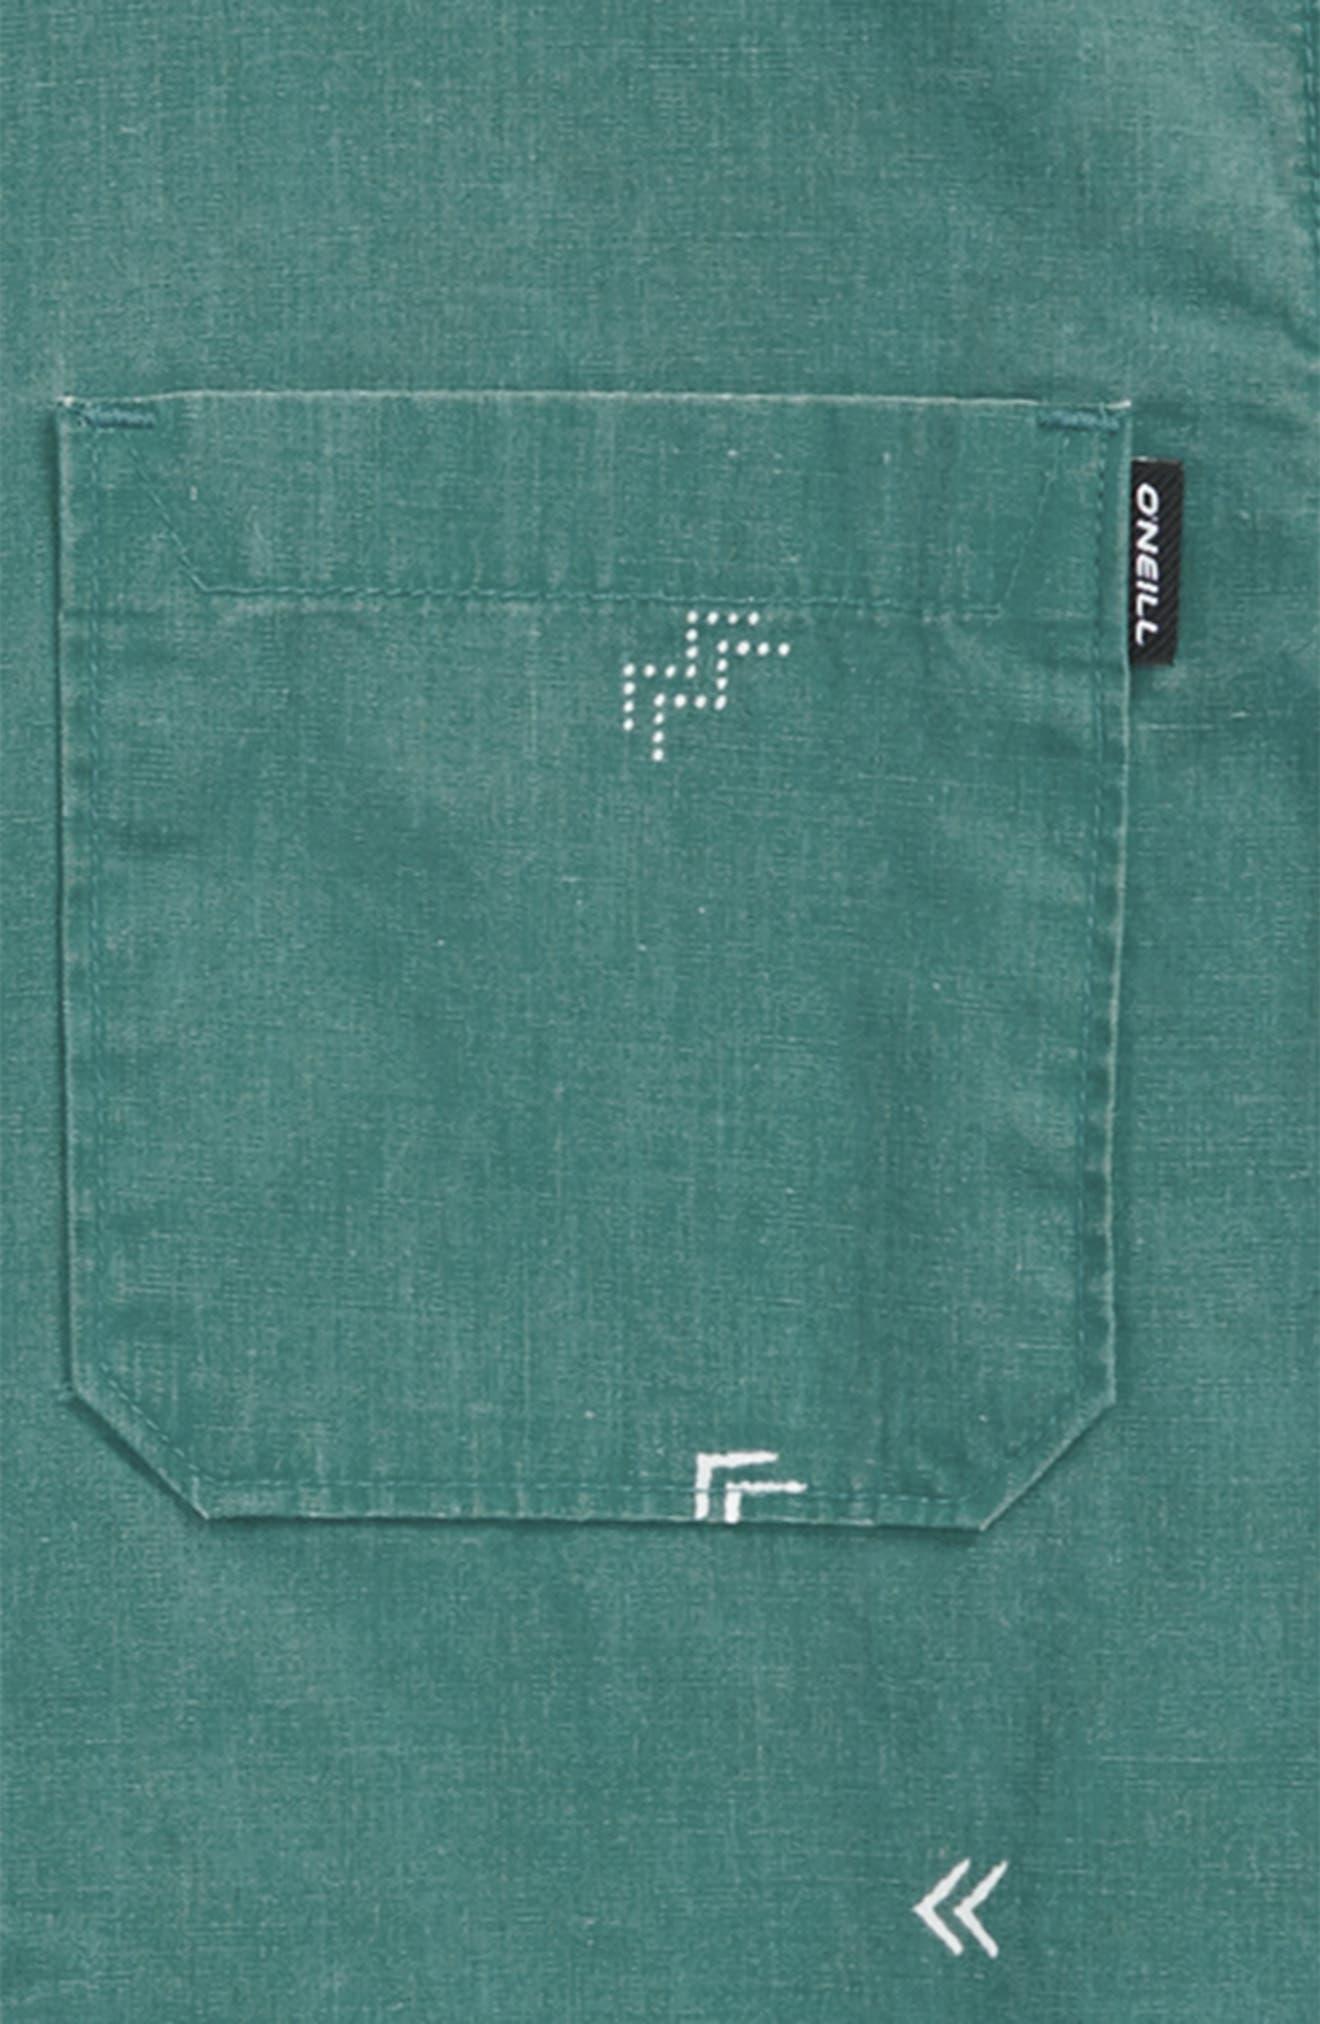 Kruger Woven Shirt,                             Alternate thumbnail 2, color,                             325